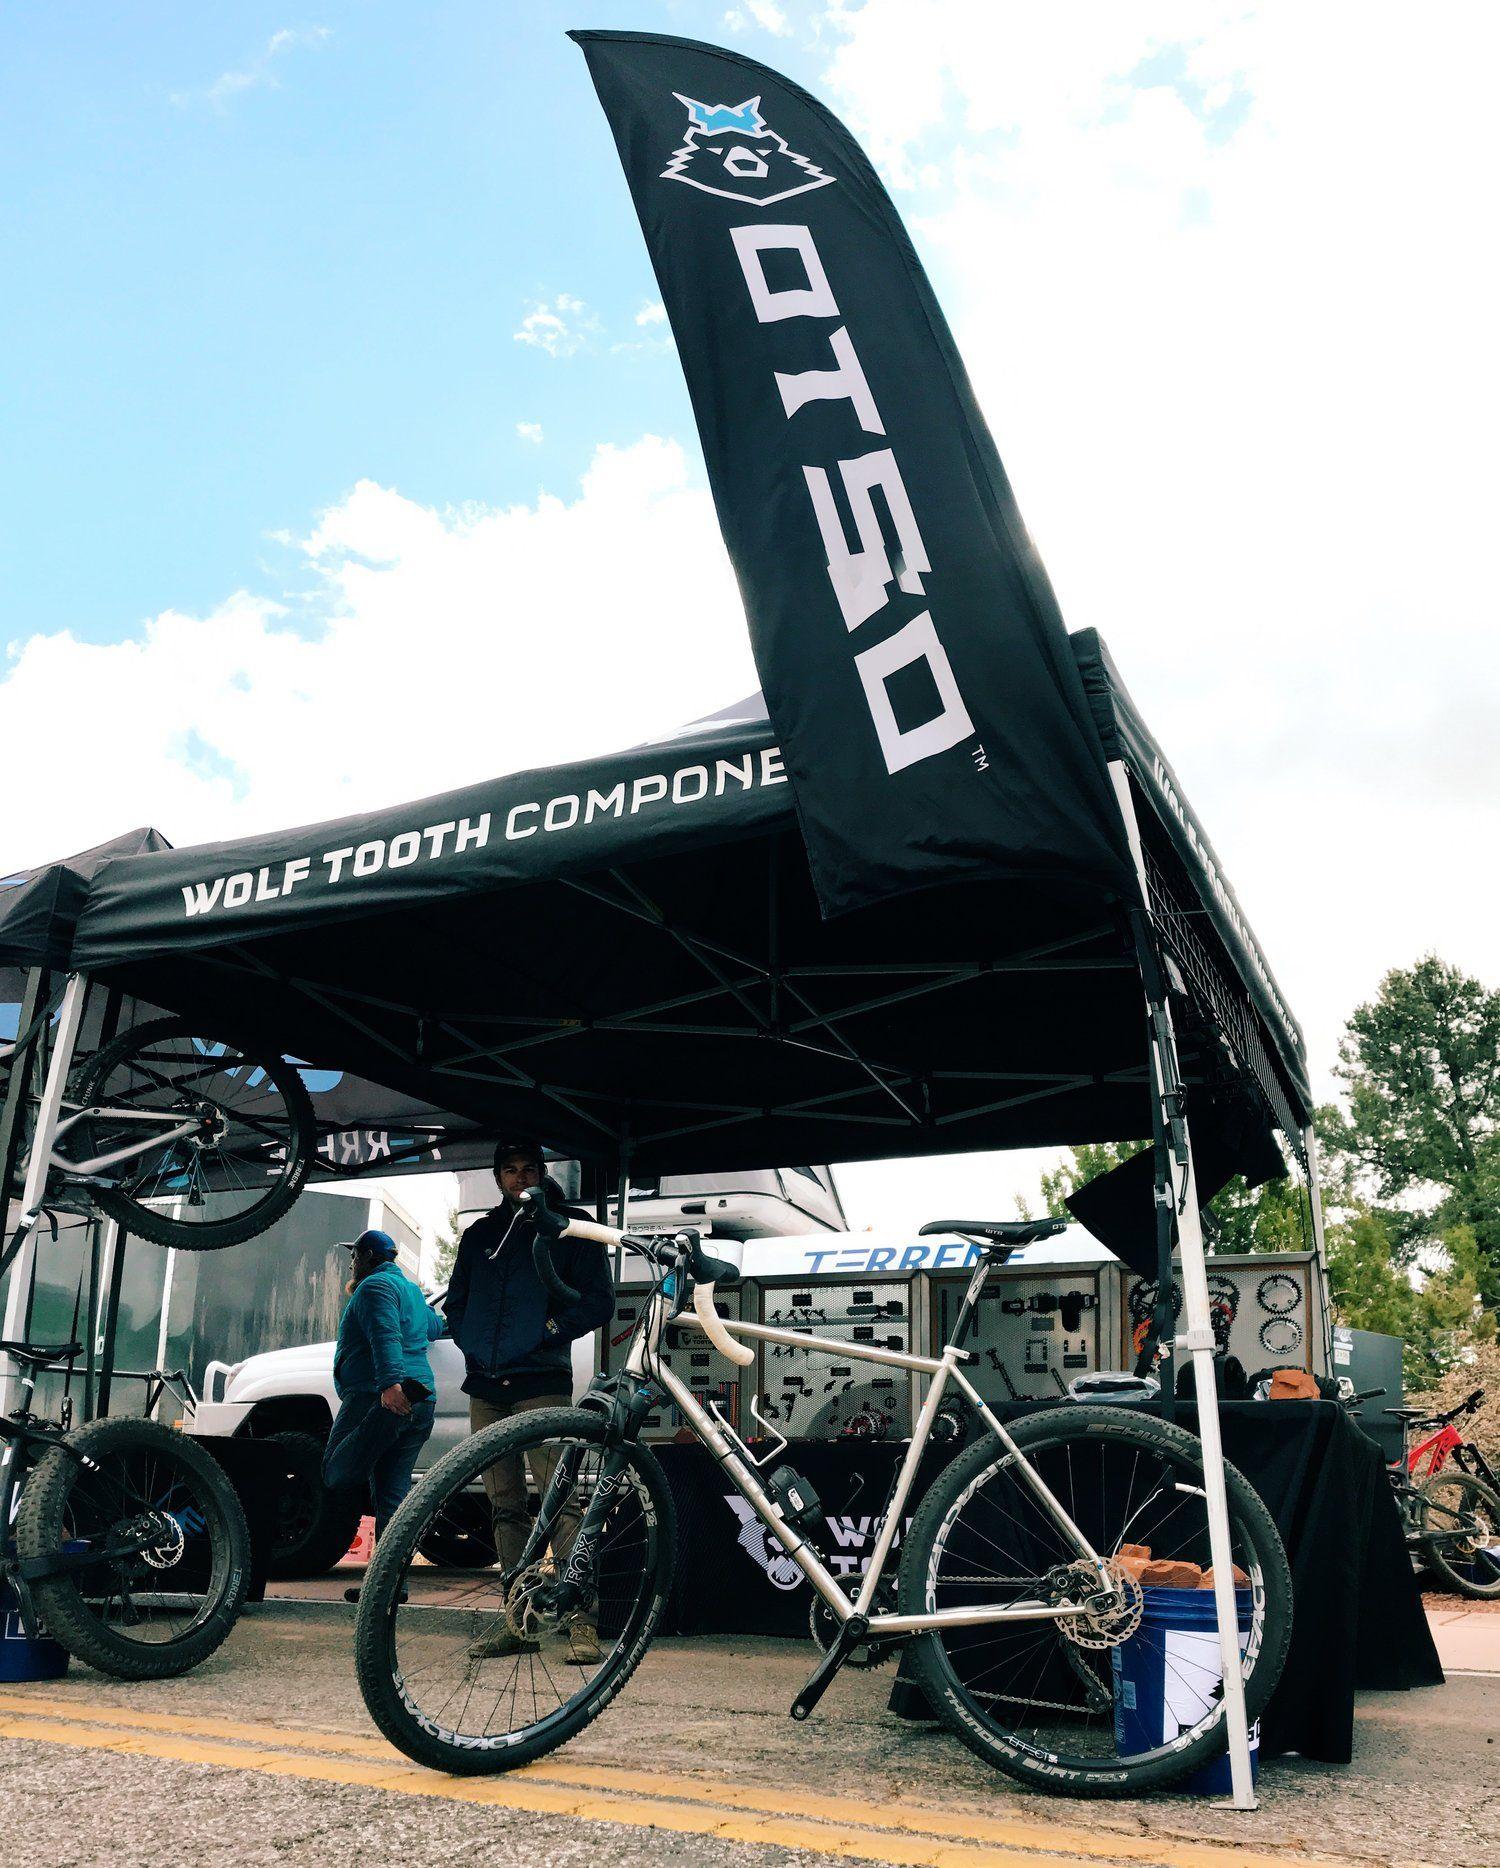 Otso Cycles Warakin Gravelstoke Gravel Bike Monster Trucks Cycle